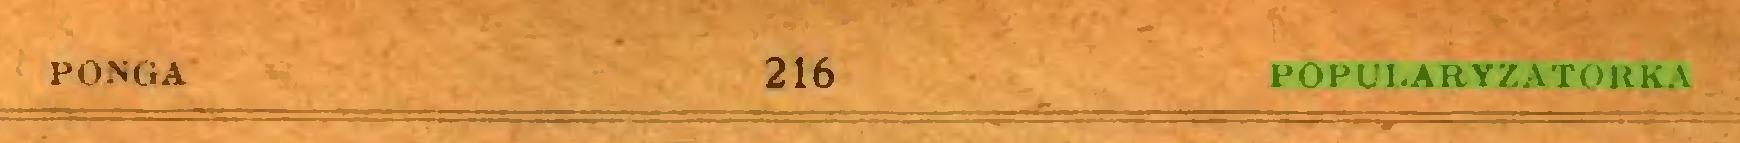 (...) PONGA 216 POPULARYZATORKA...